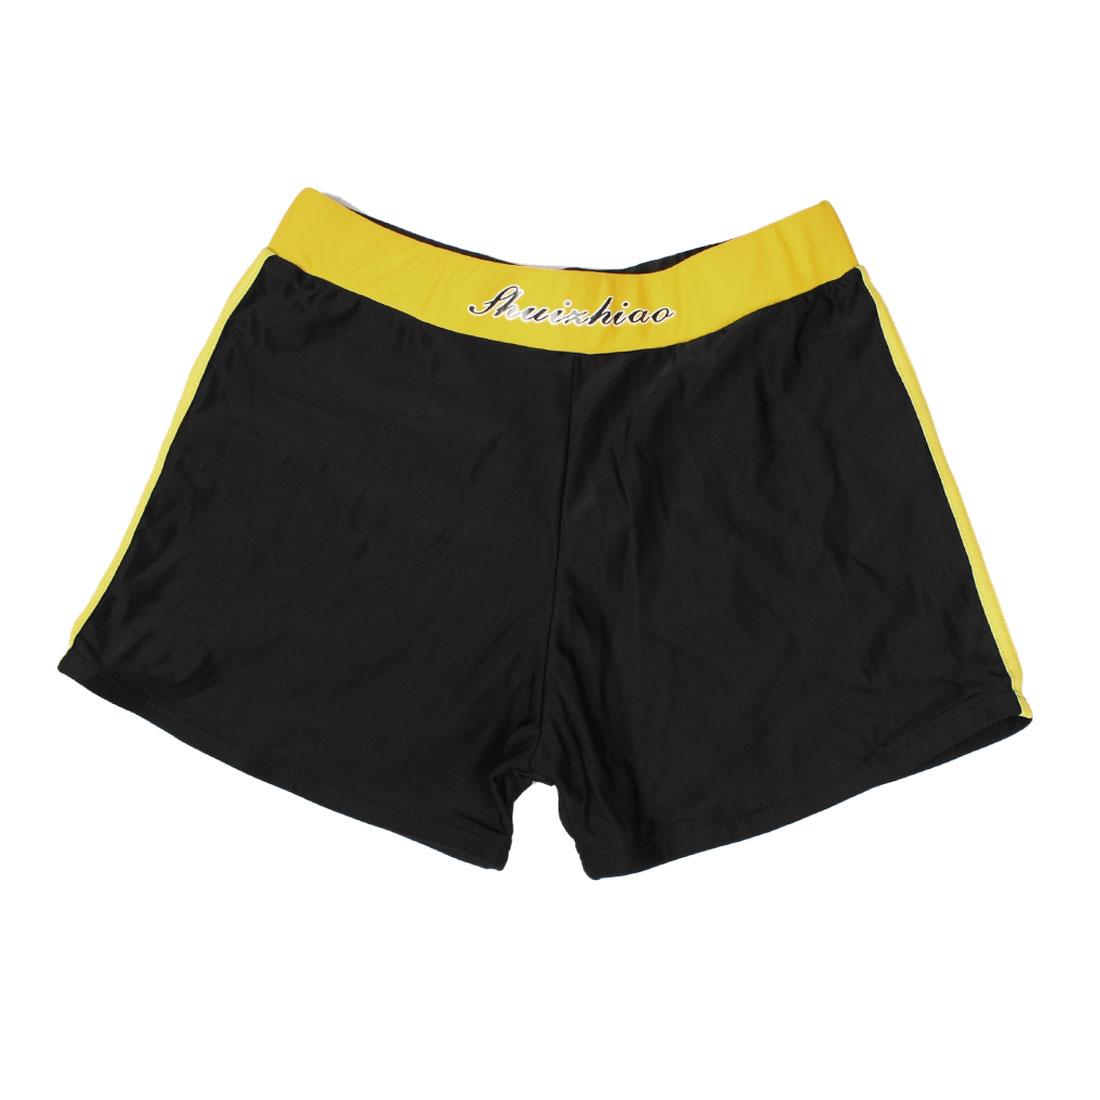 Children Boy Black Yellow Drawstring Elastic Waist Swim Pants Trunks US L